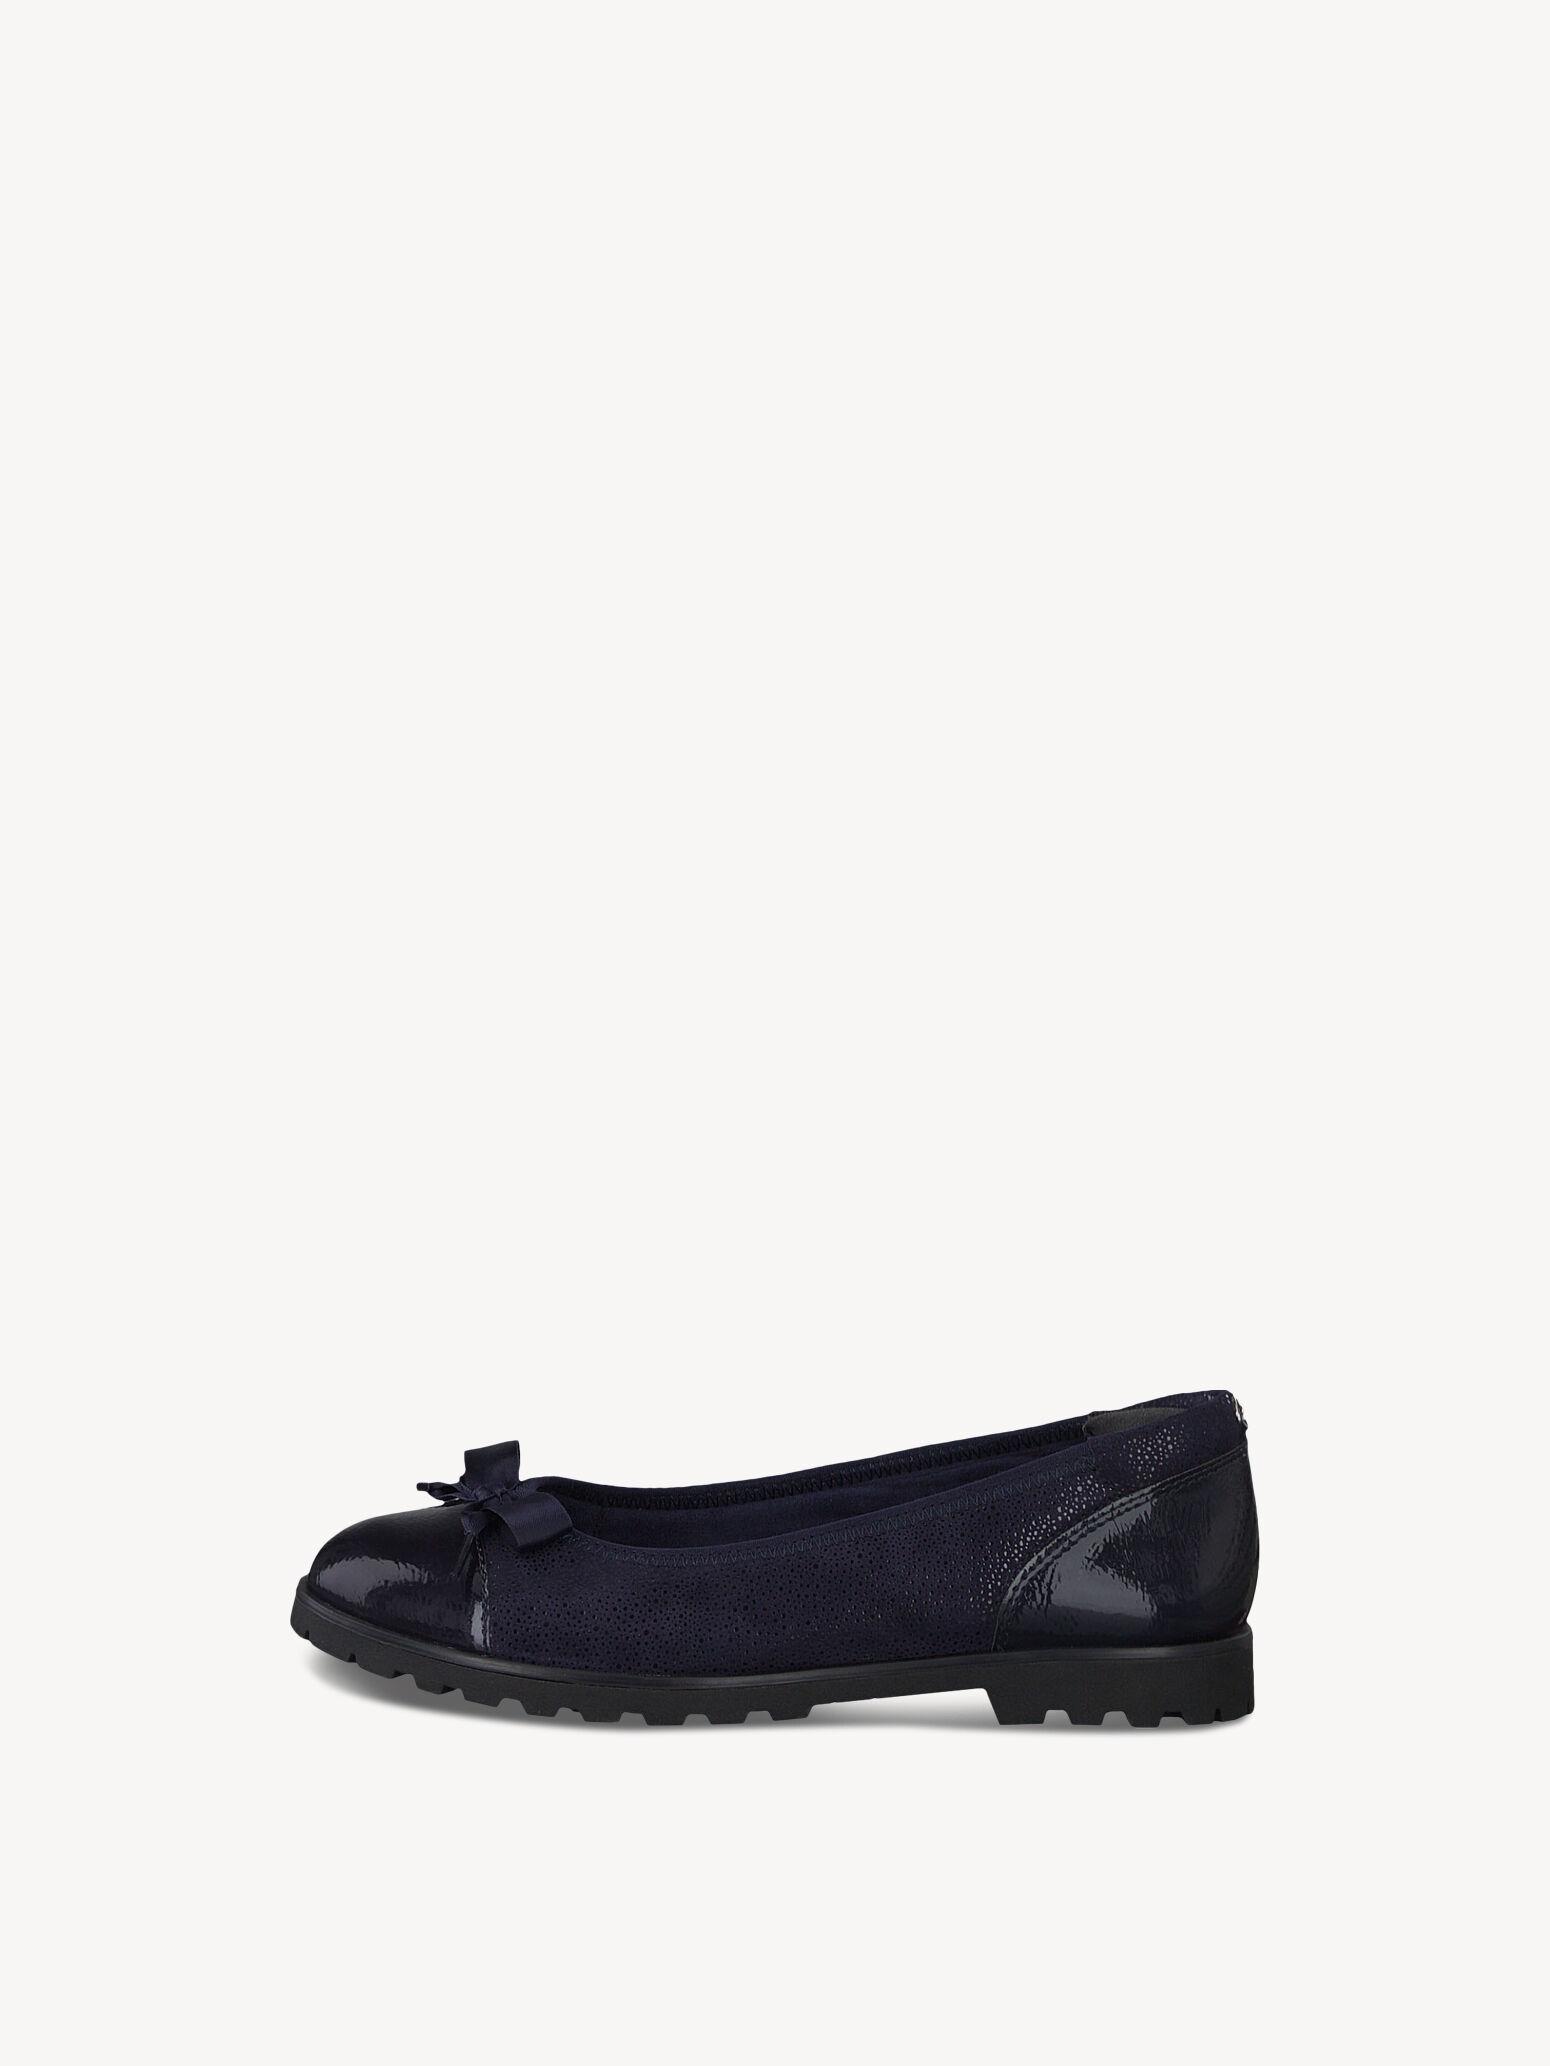 Leopardenmuster Schuhe in Damen Halbschuhe & Ballerinas